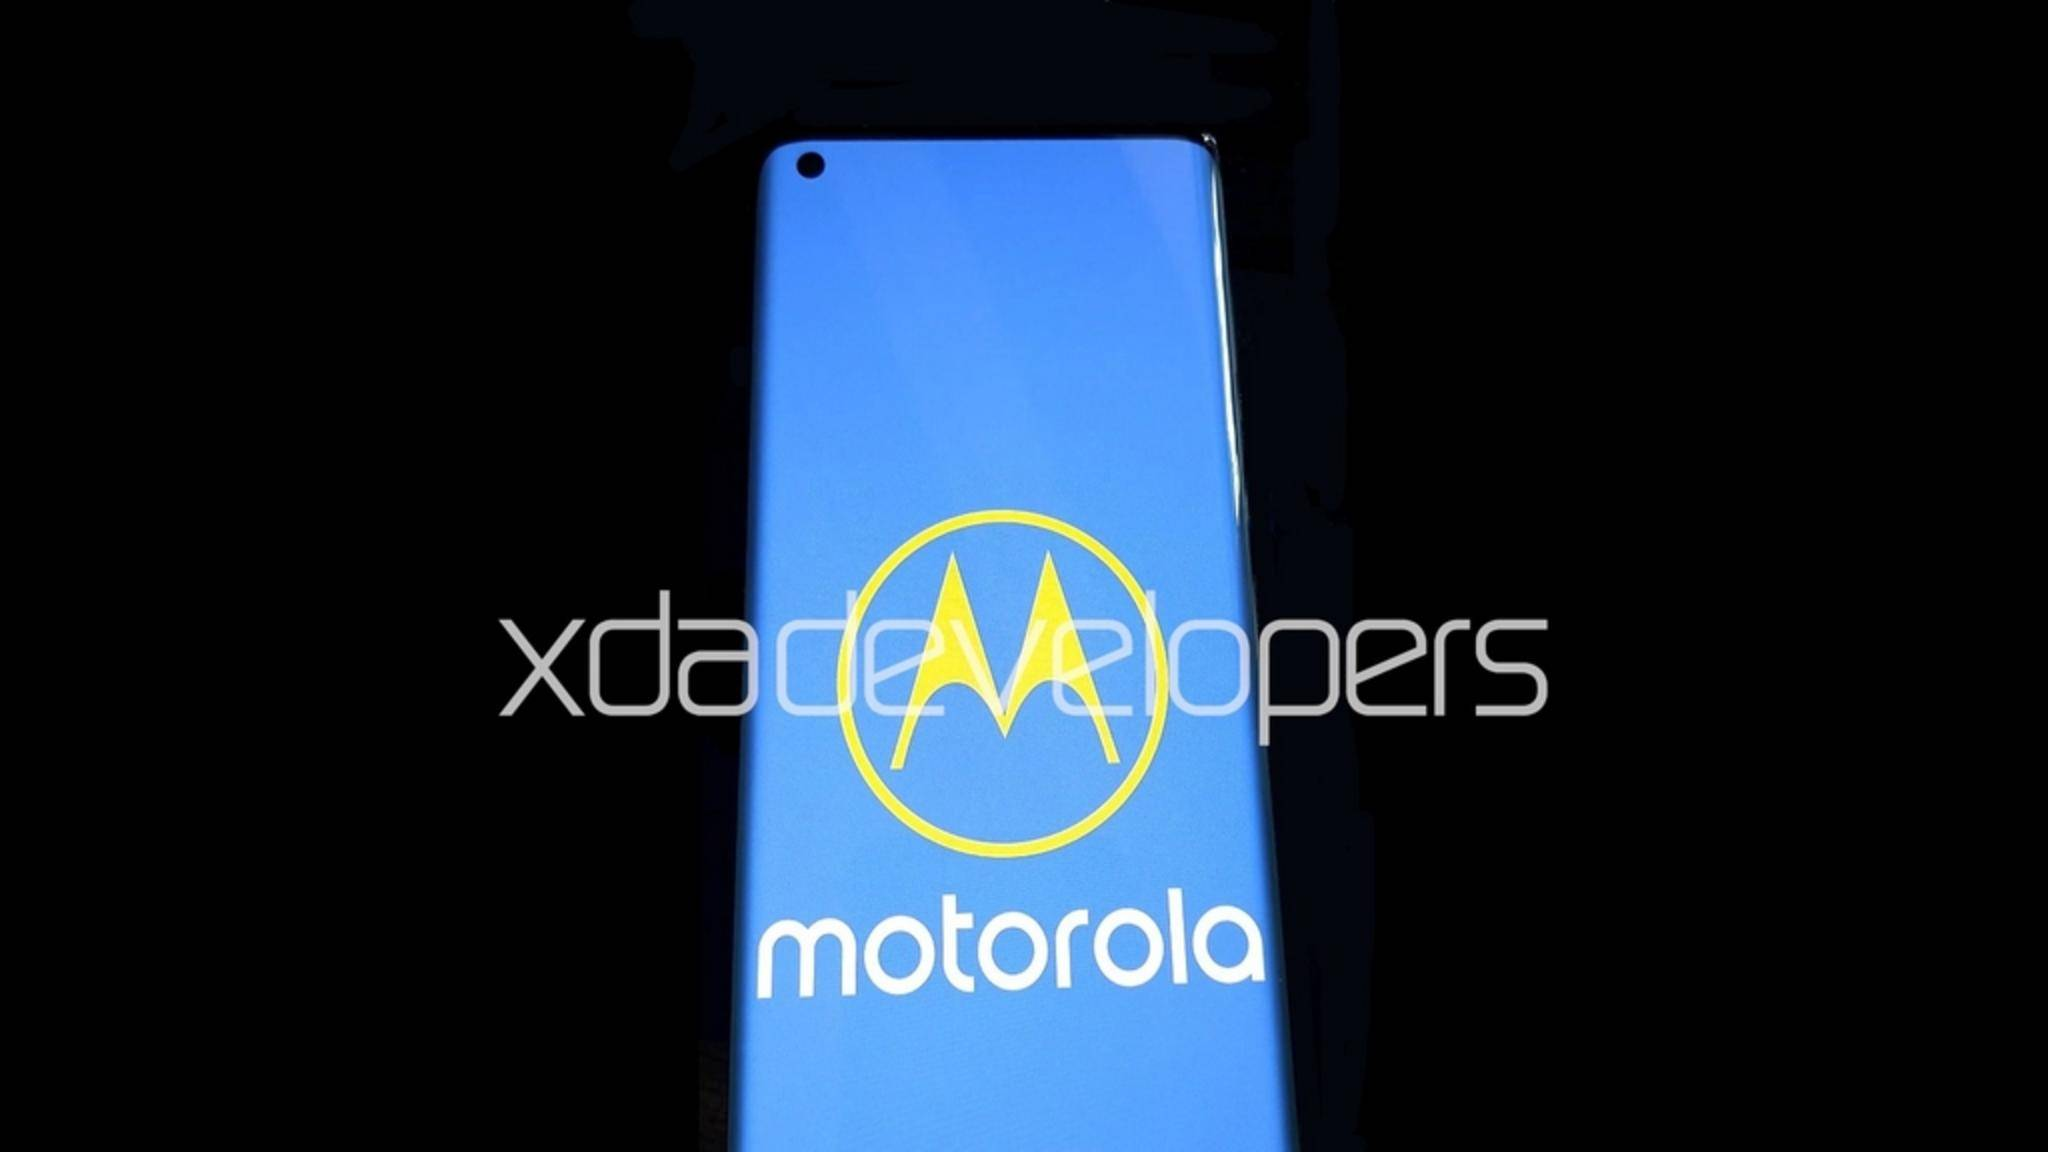 So soll das neue Motorola-Flaggschiff aussehen.